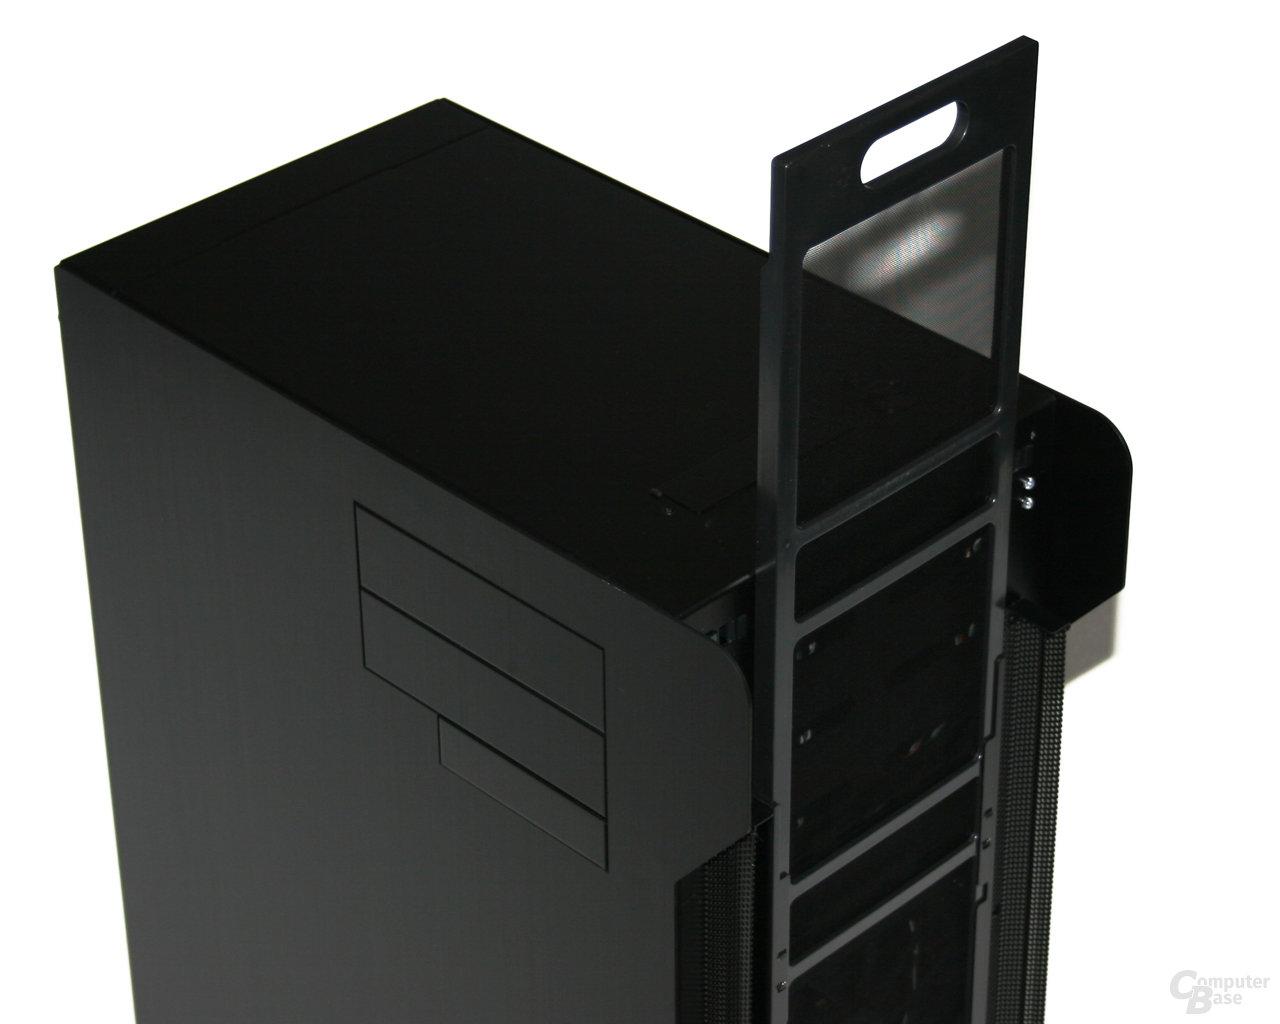 Lian Li TYR Super-Case PC-X2000BW – herausnehmbarer Staubfilter